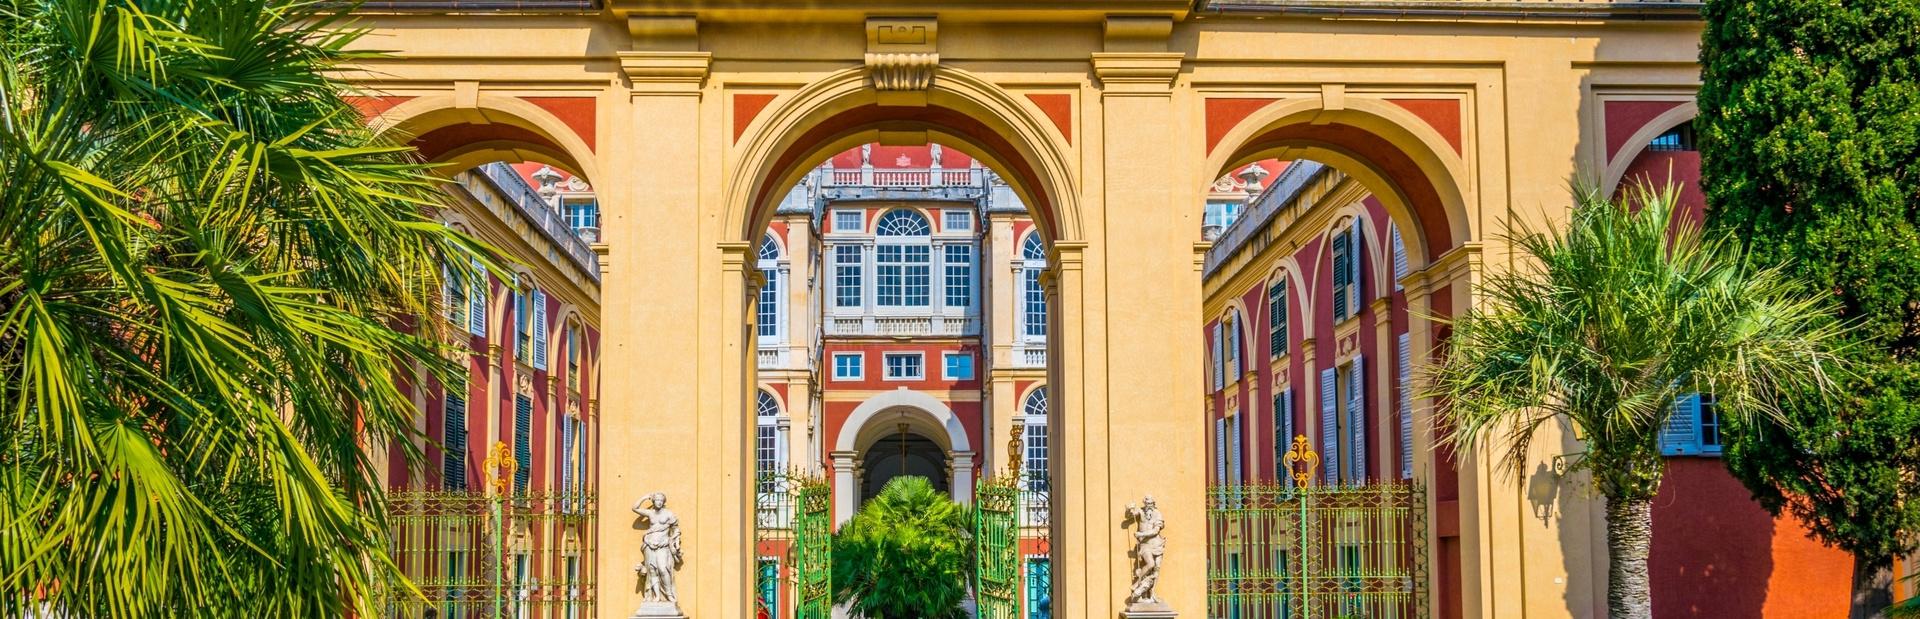 Genoa news photo